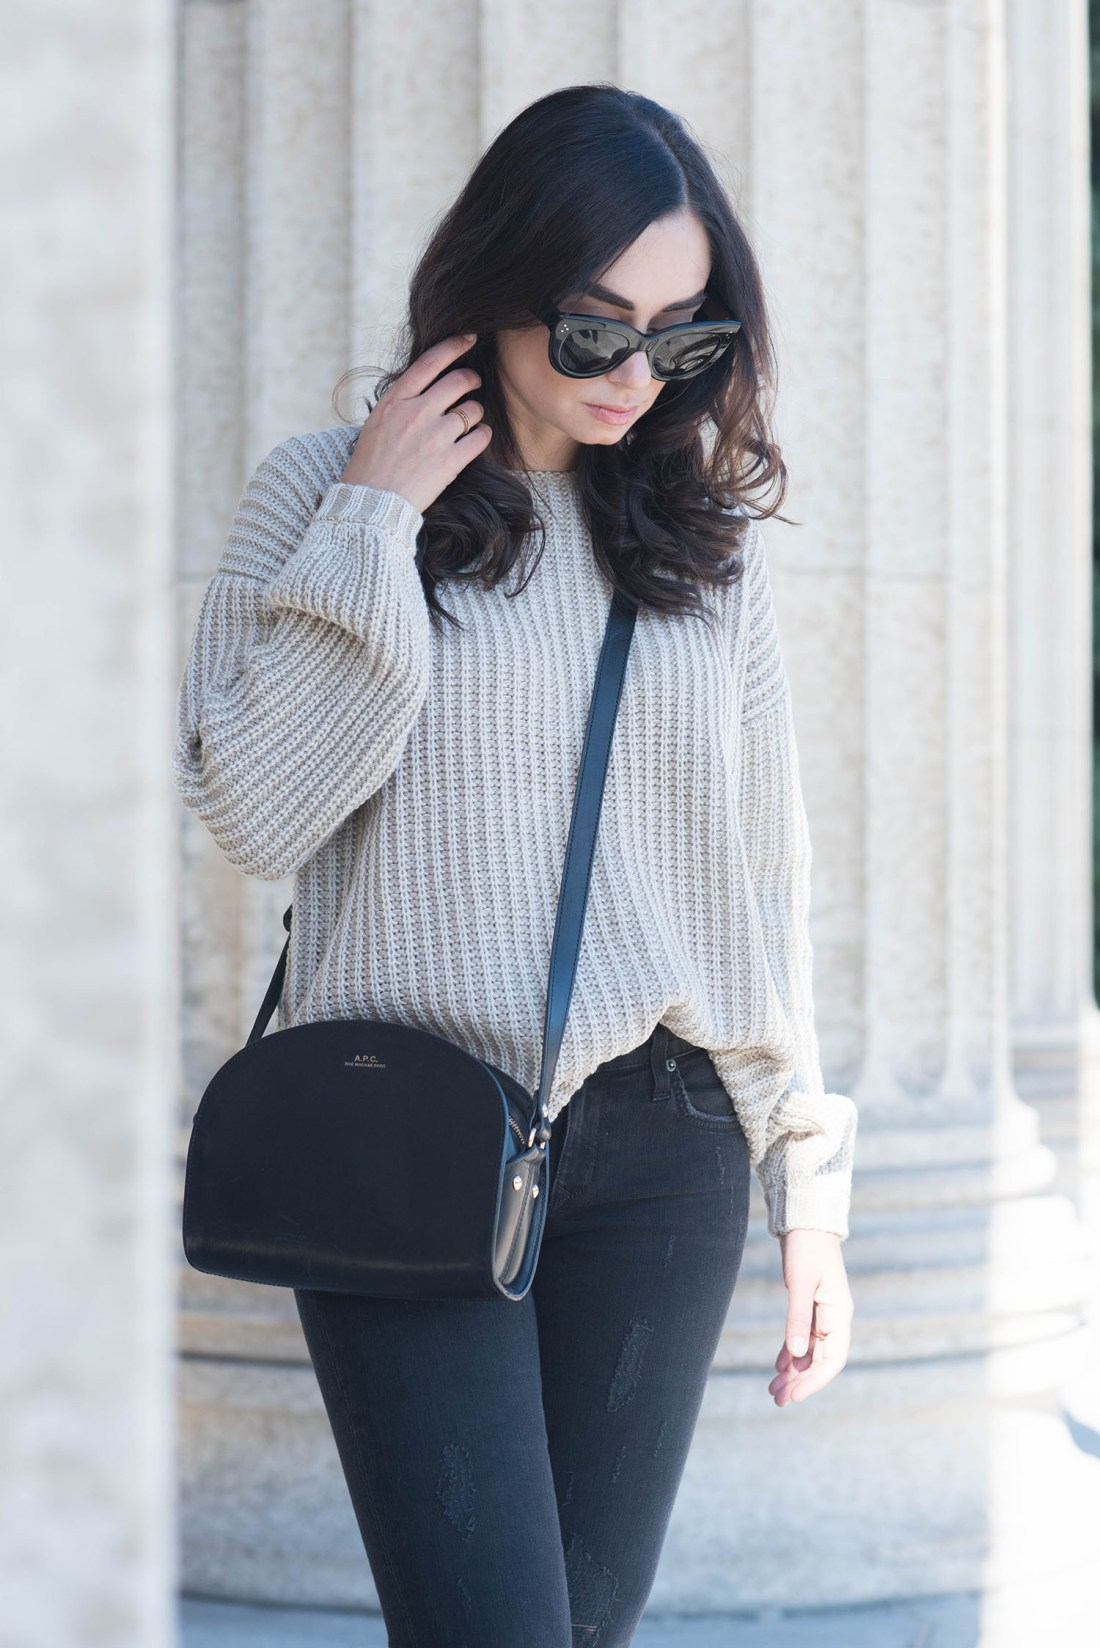 Portrait of fashion blogger Cee Fardoe of Coco & Vera, wearing a Tobi sweater, APC halfmoon bag and Celine sunglasses